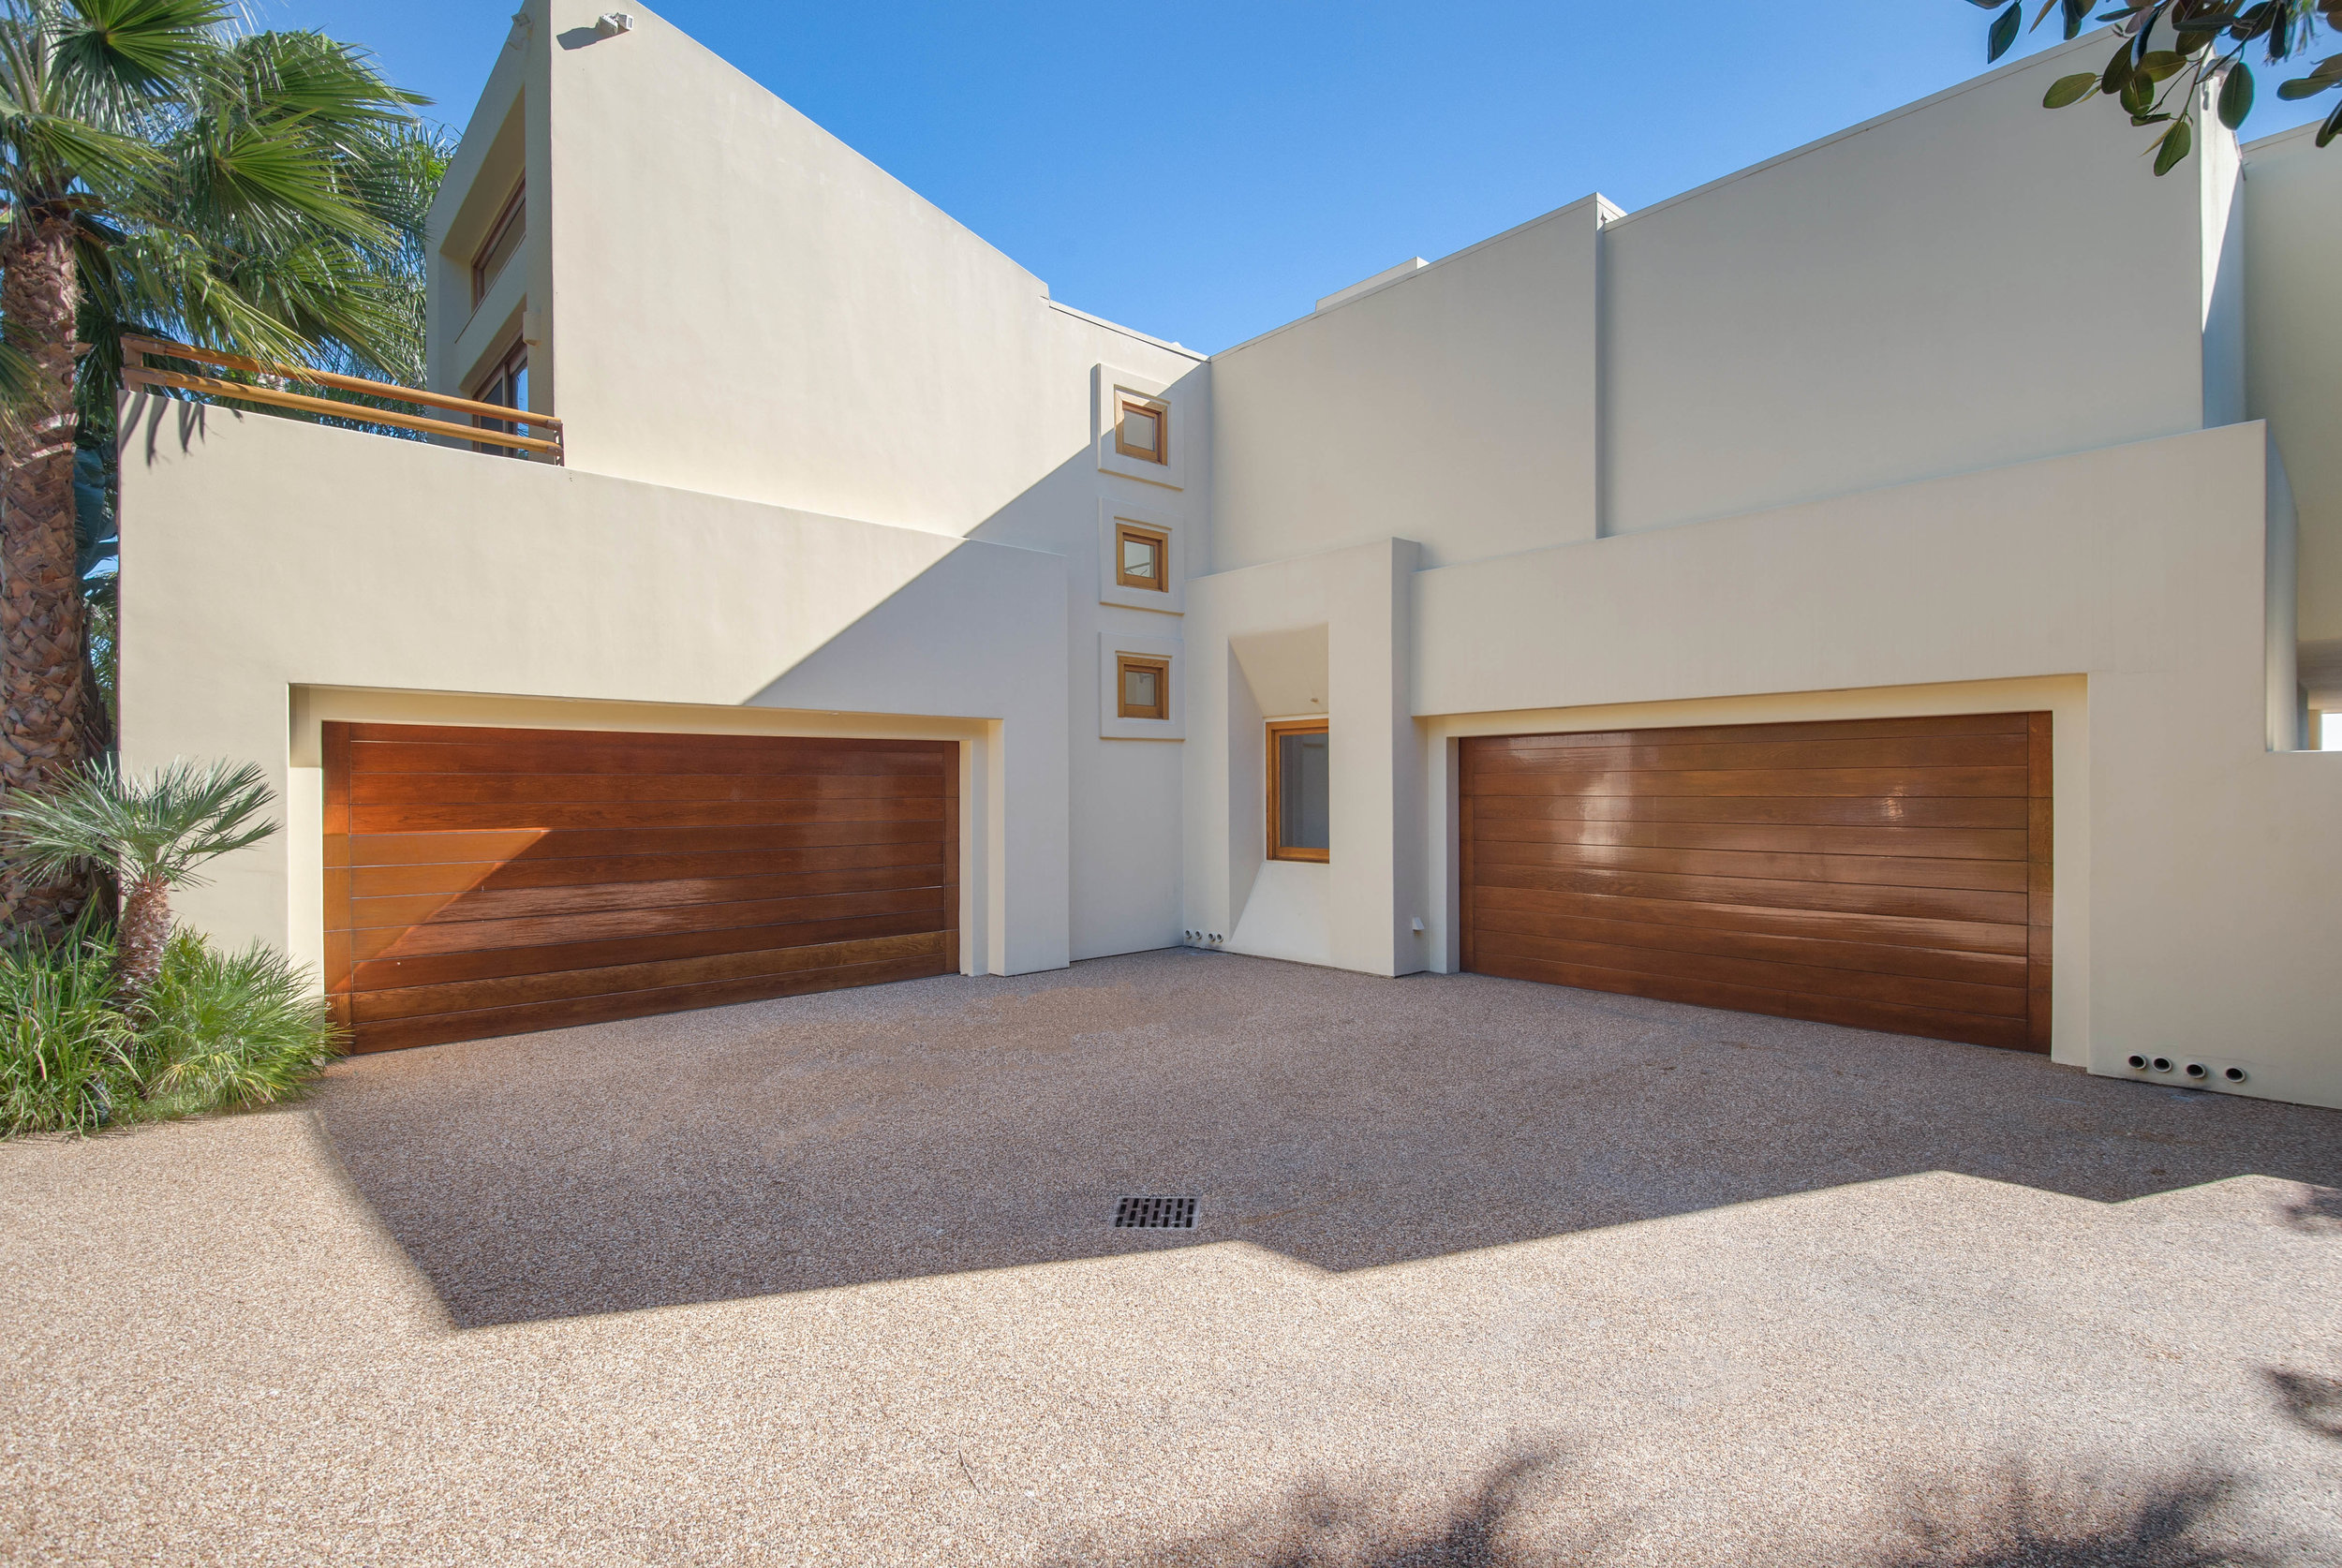 027 Garage 27475 Latigo Bay View Drive For Sale Lease The Malibu Life Team Luxury Real Estate.jpg